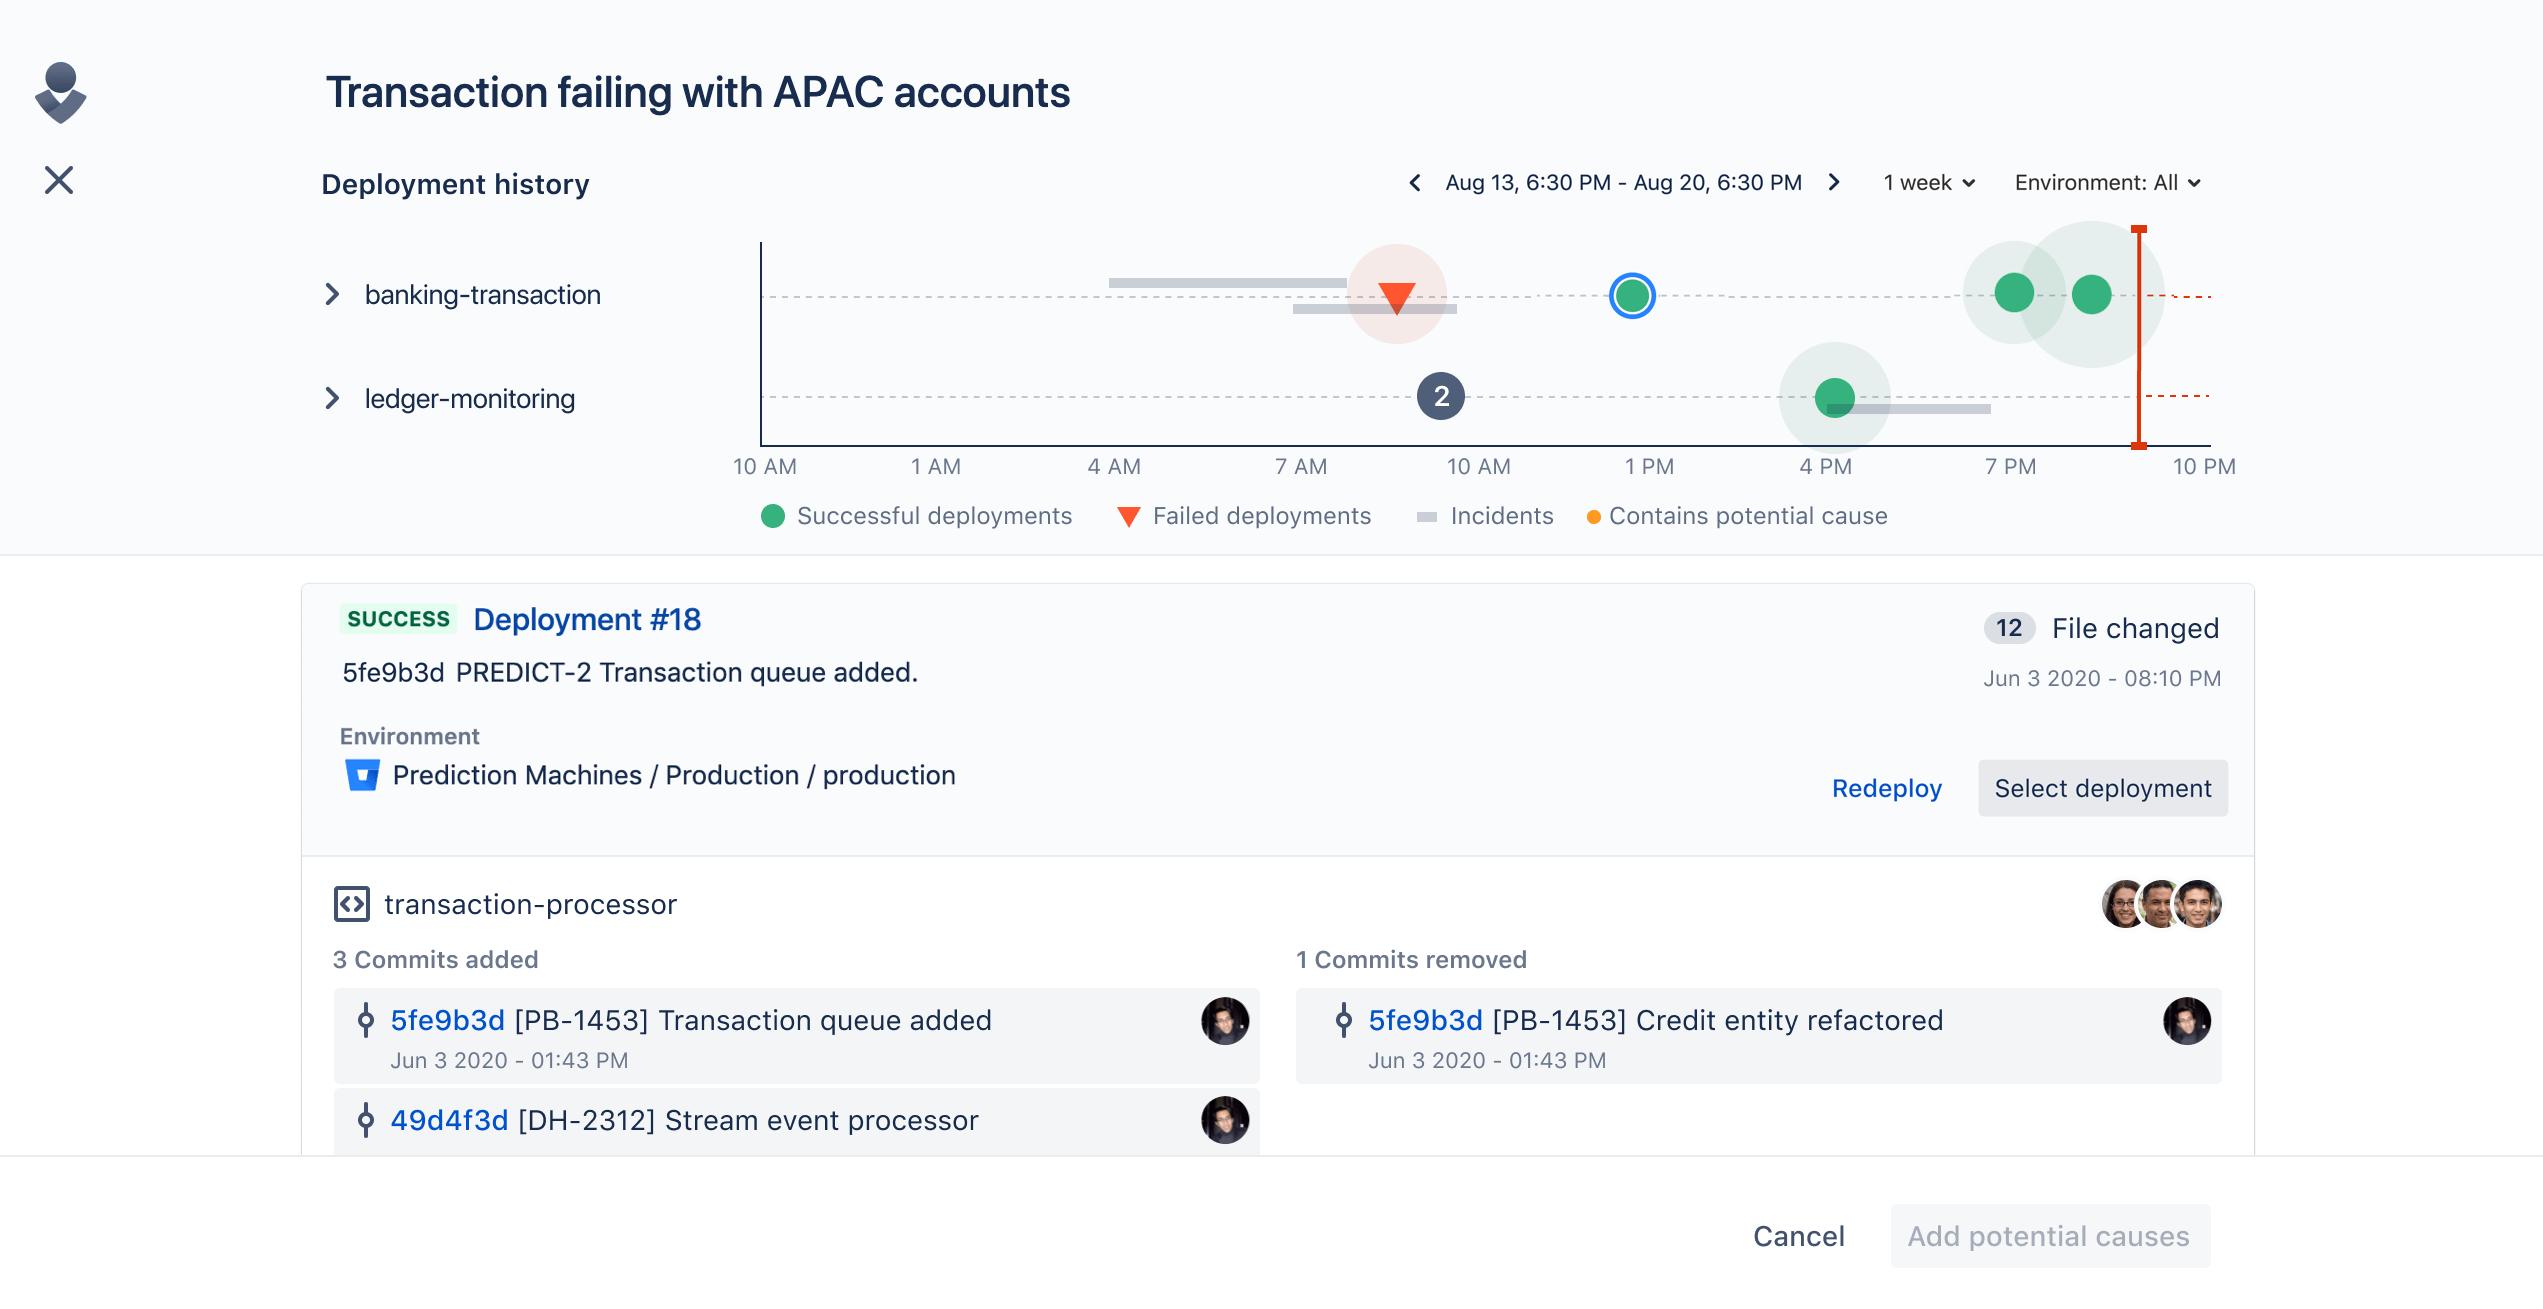 Transaction failing metrics